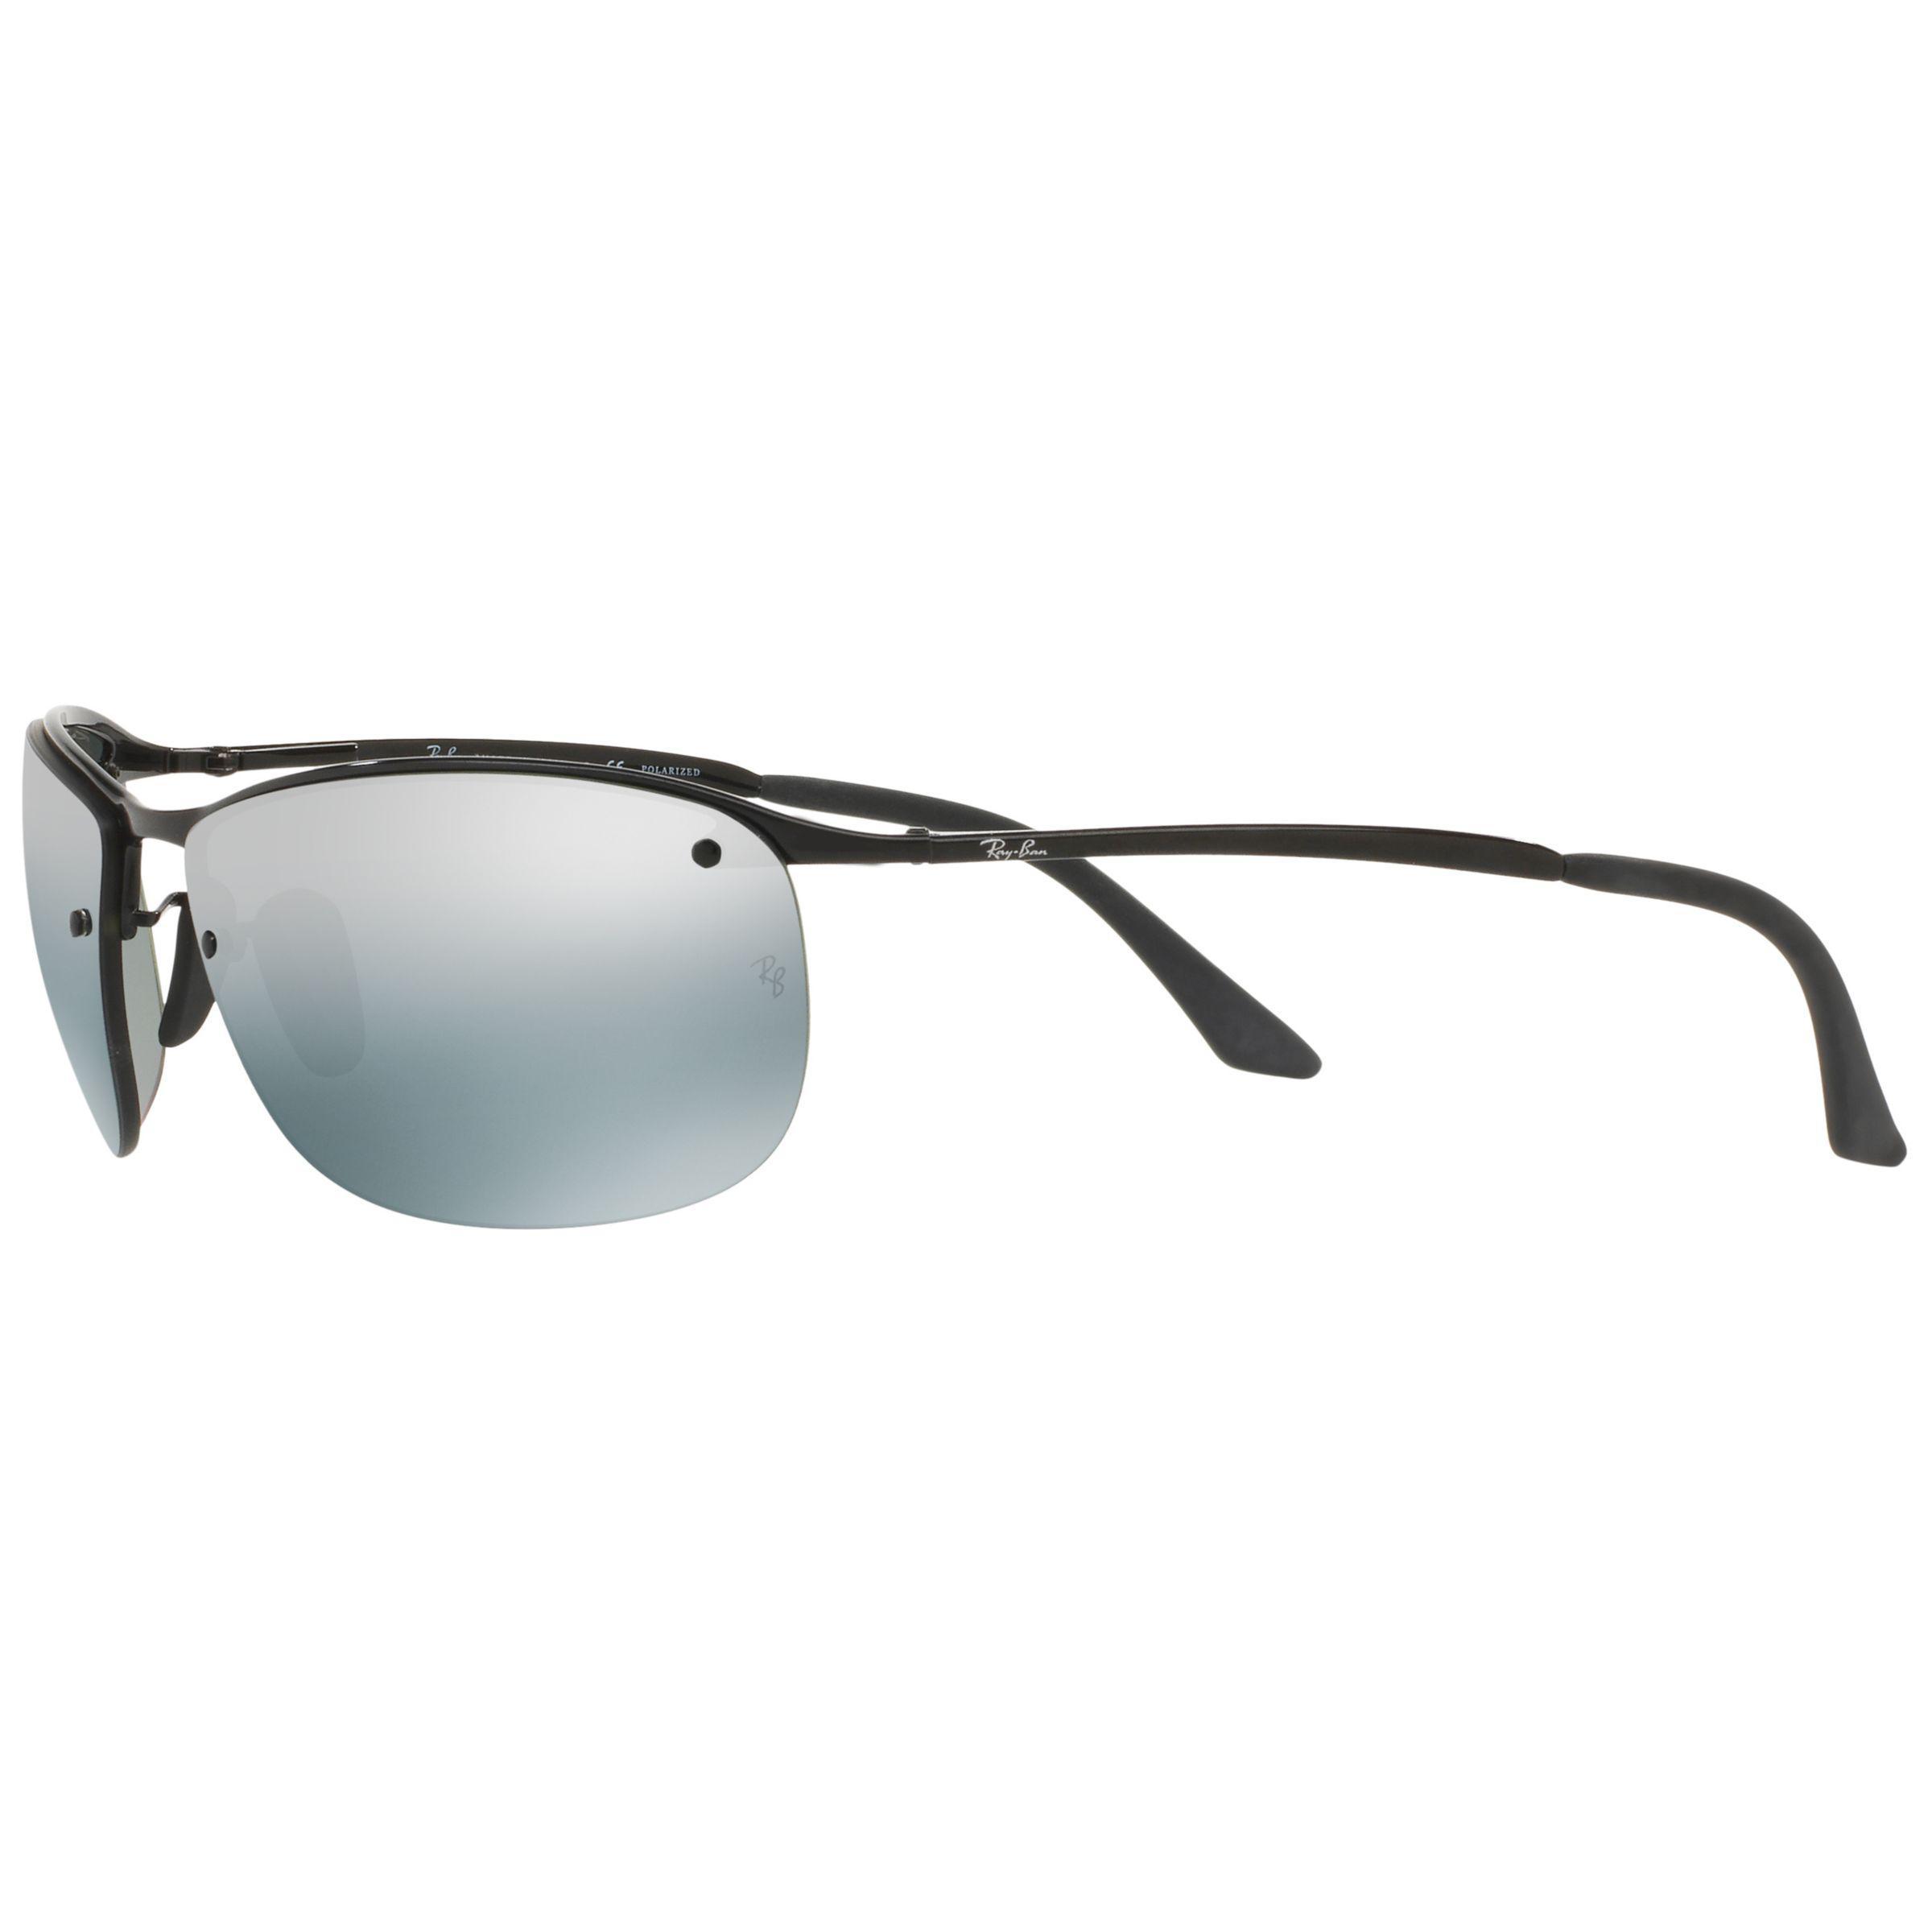 dc3486445e Ray-Ban Rb3542 Polarised Chromance Rectangular Sunglasses in Black ...